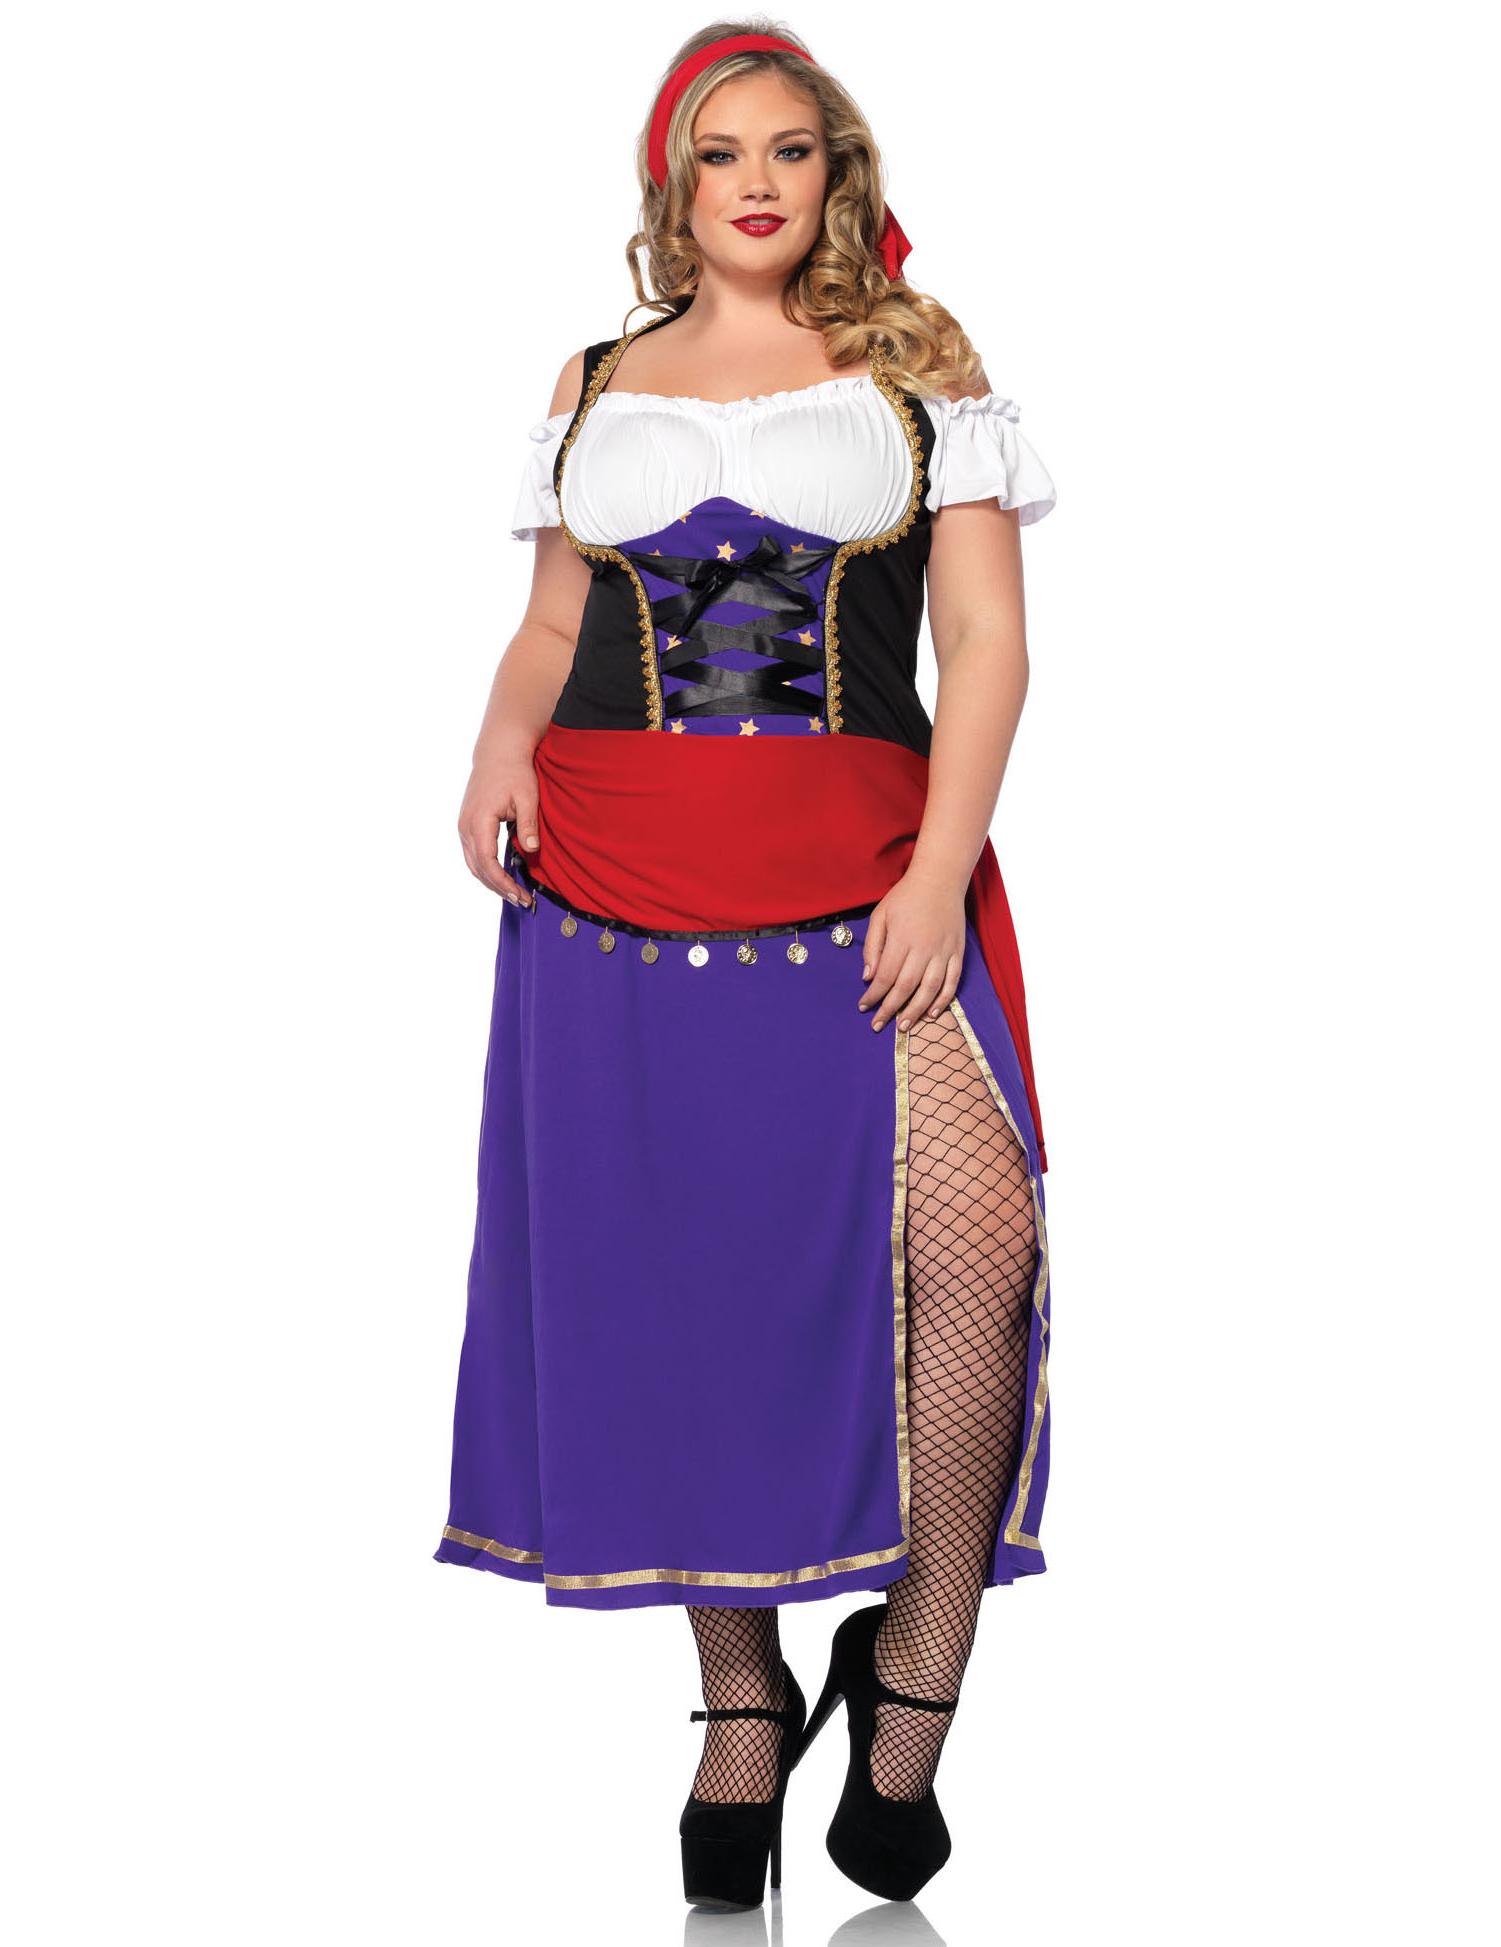 d619ded79572 Costume Gitana per donna - taglie forti  Costumi adulti